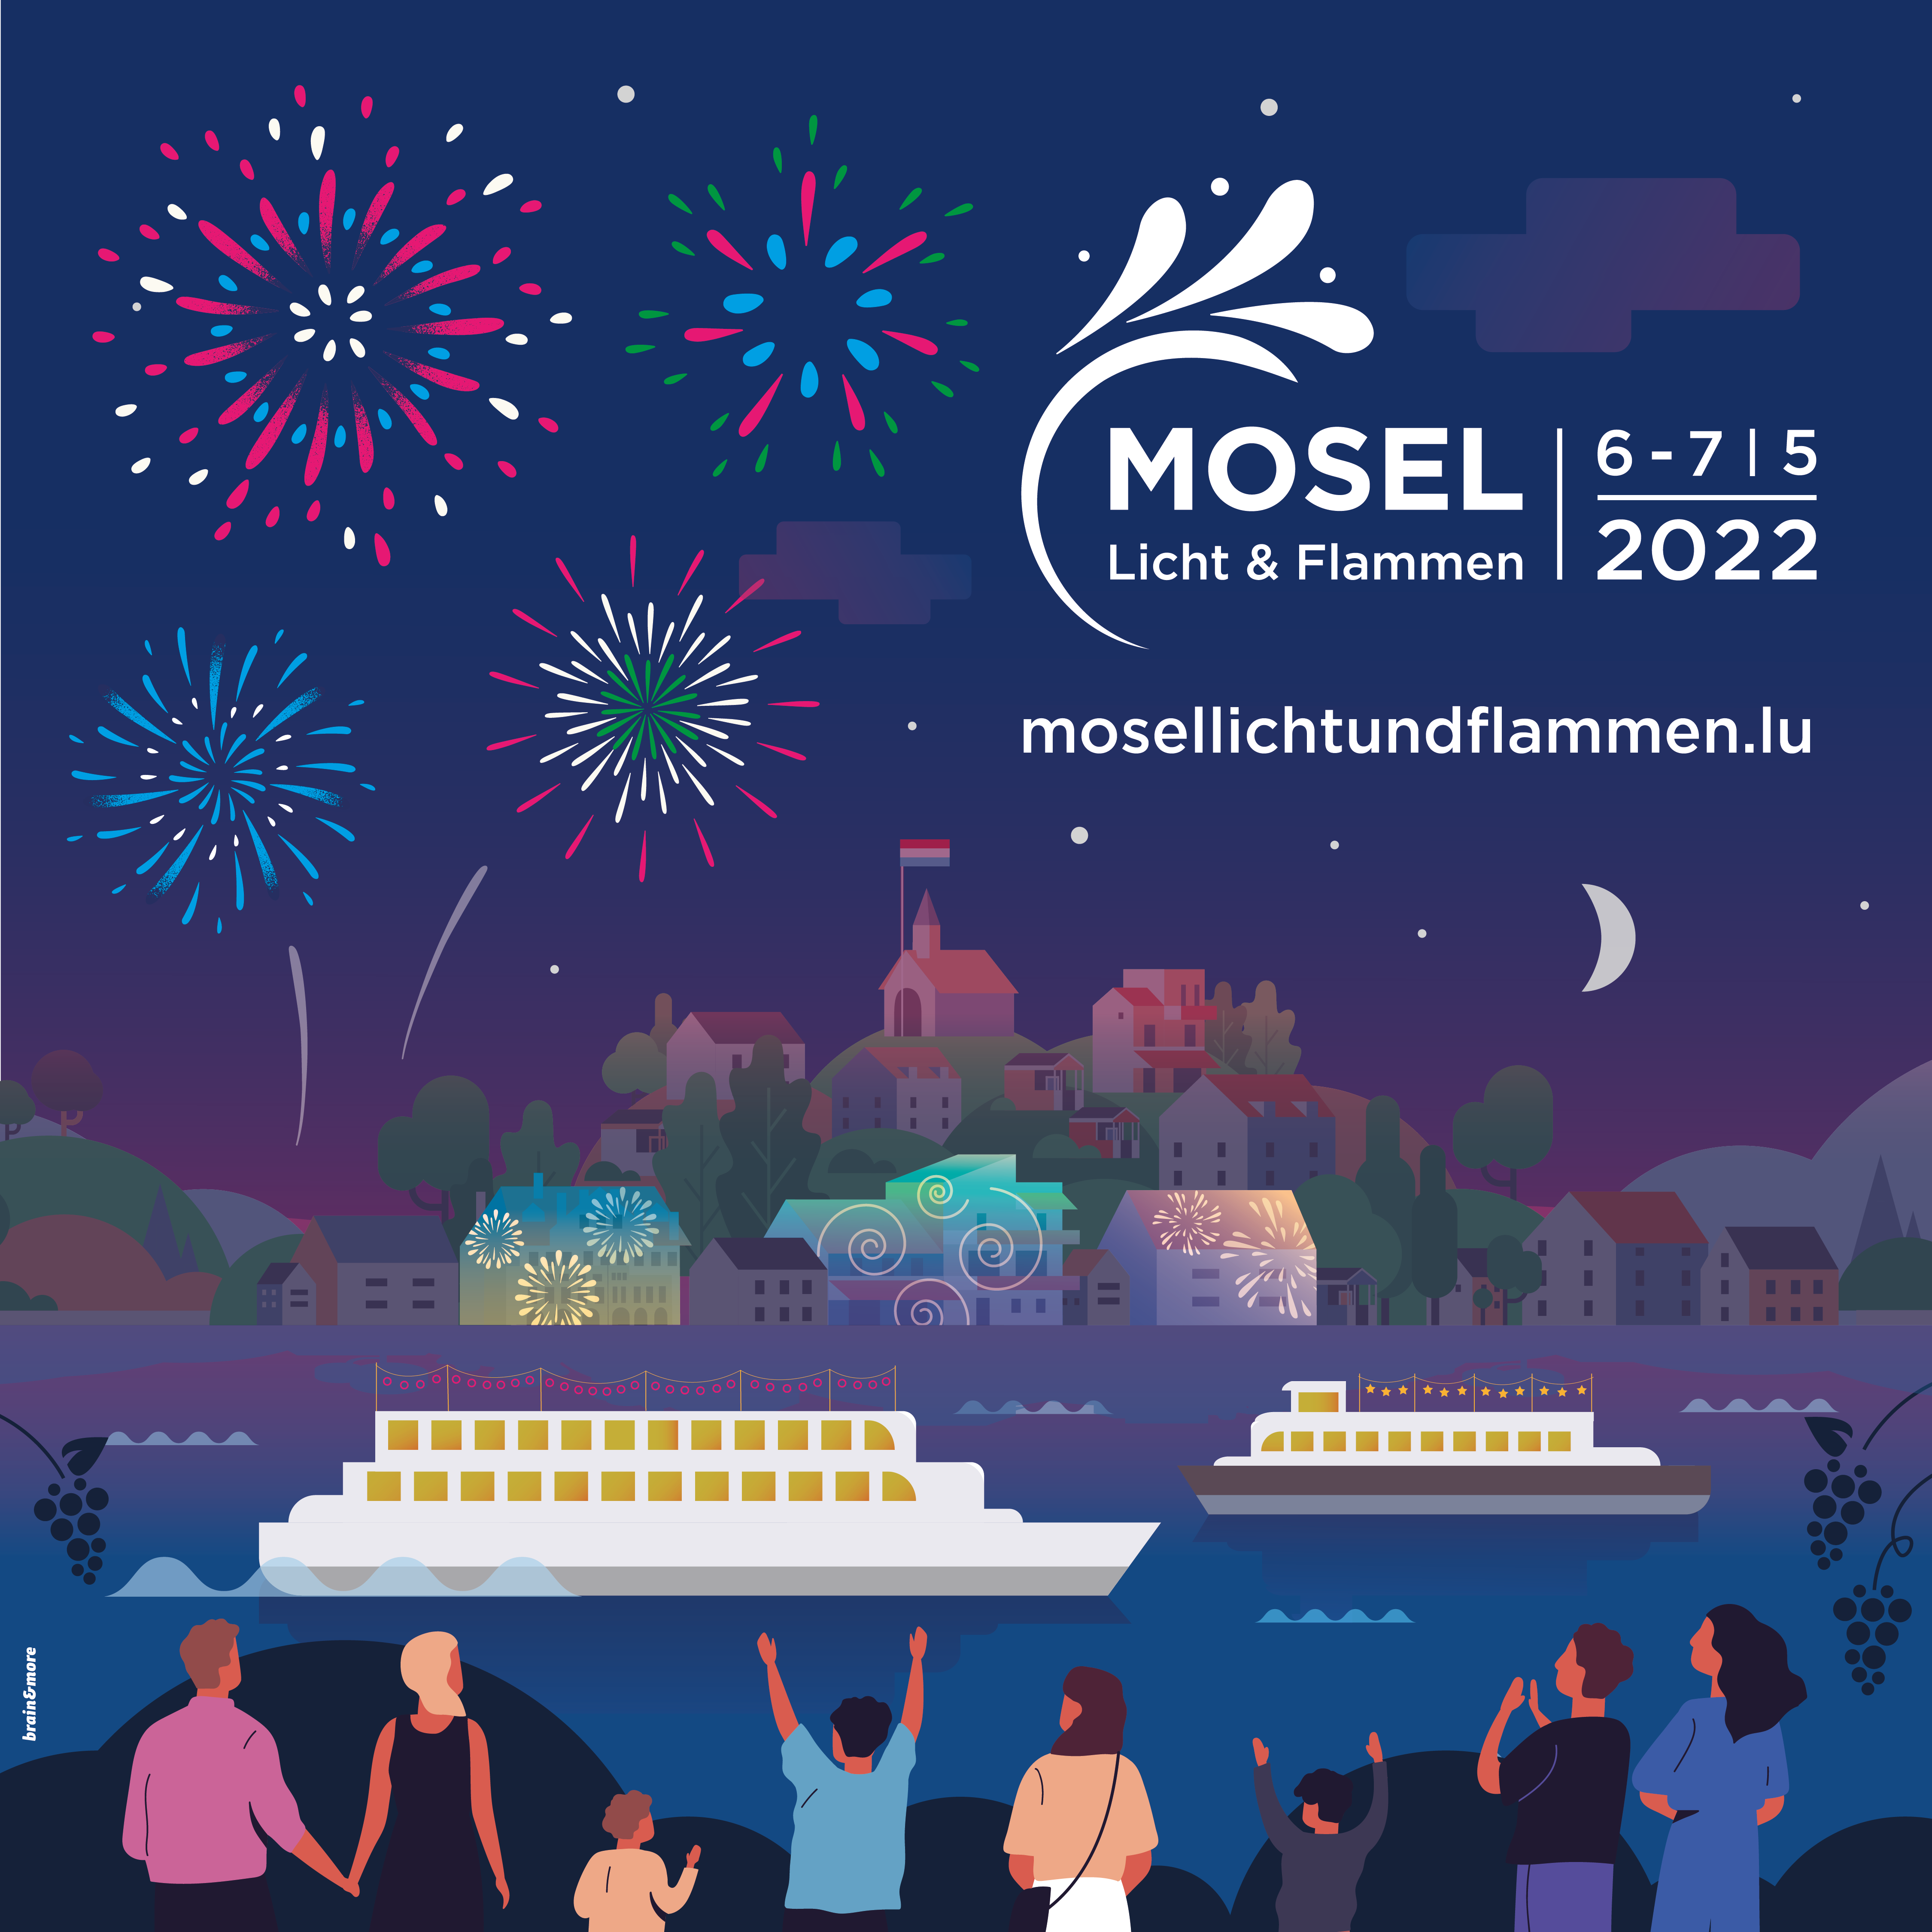 Mosel_Licht-und-Flammen-2022-1.png#asset:1653